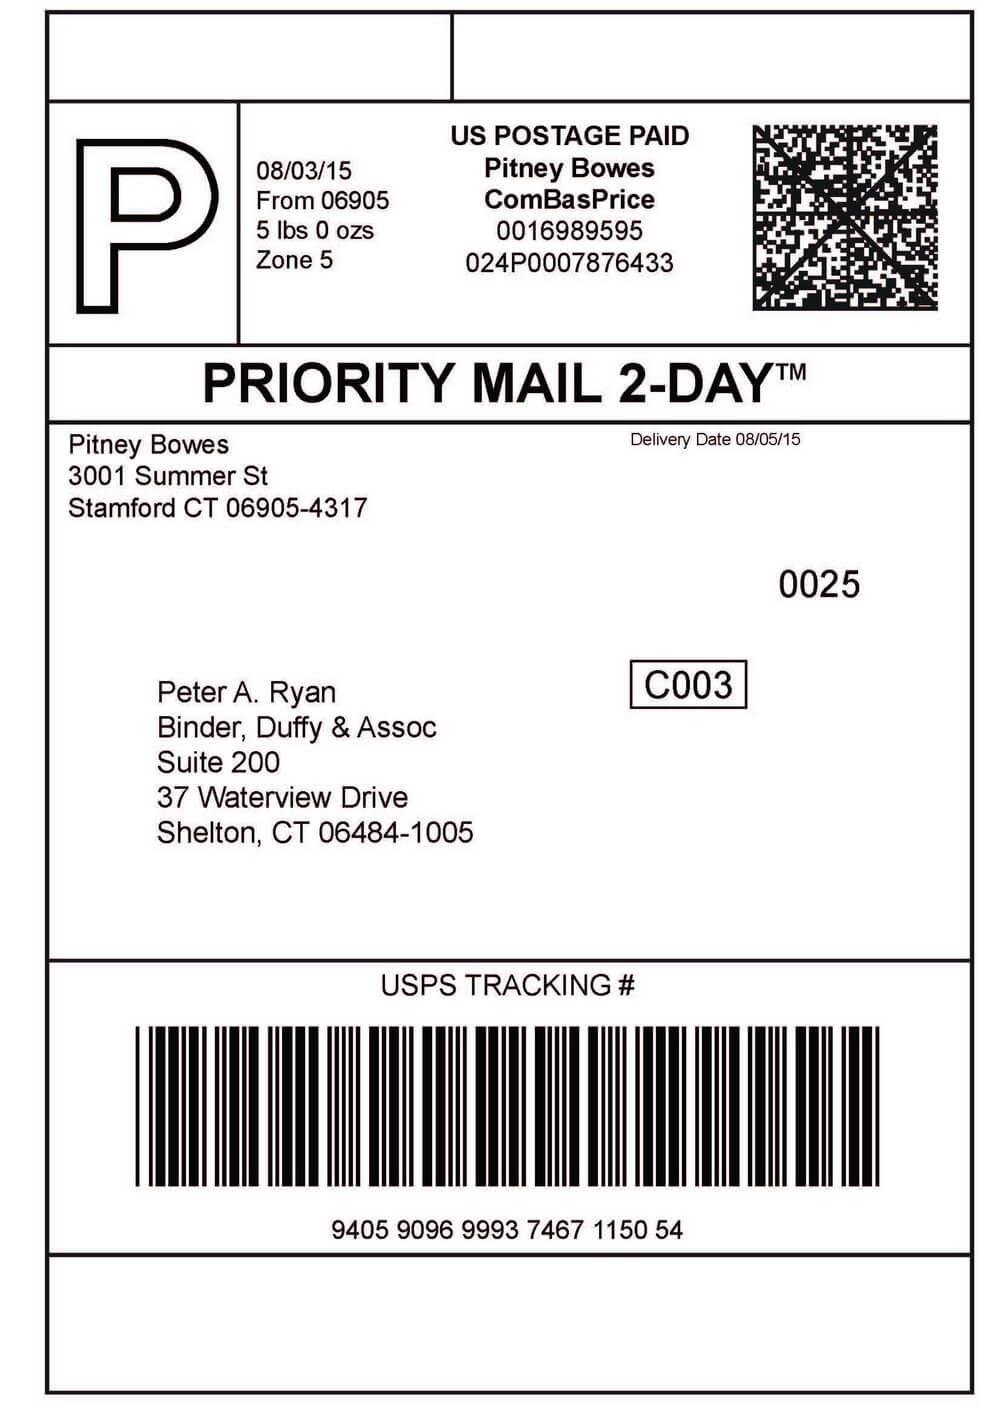 004 Shipping Label Template Word Shocking Ideas Free Large Regarding Fedex Label Template Word